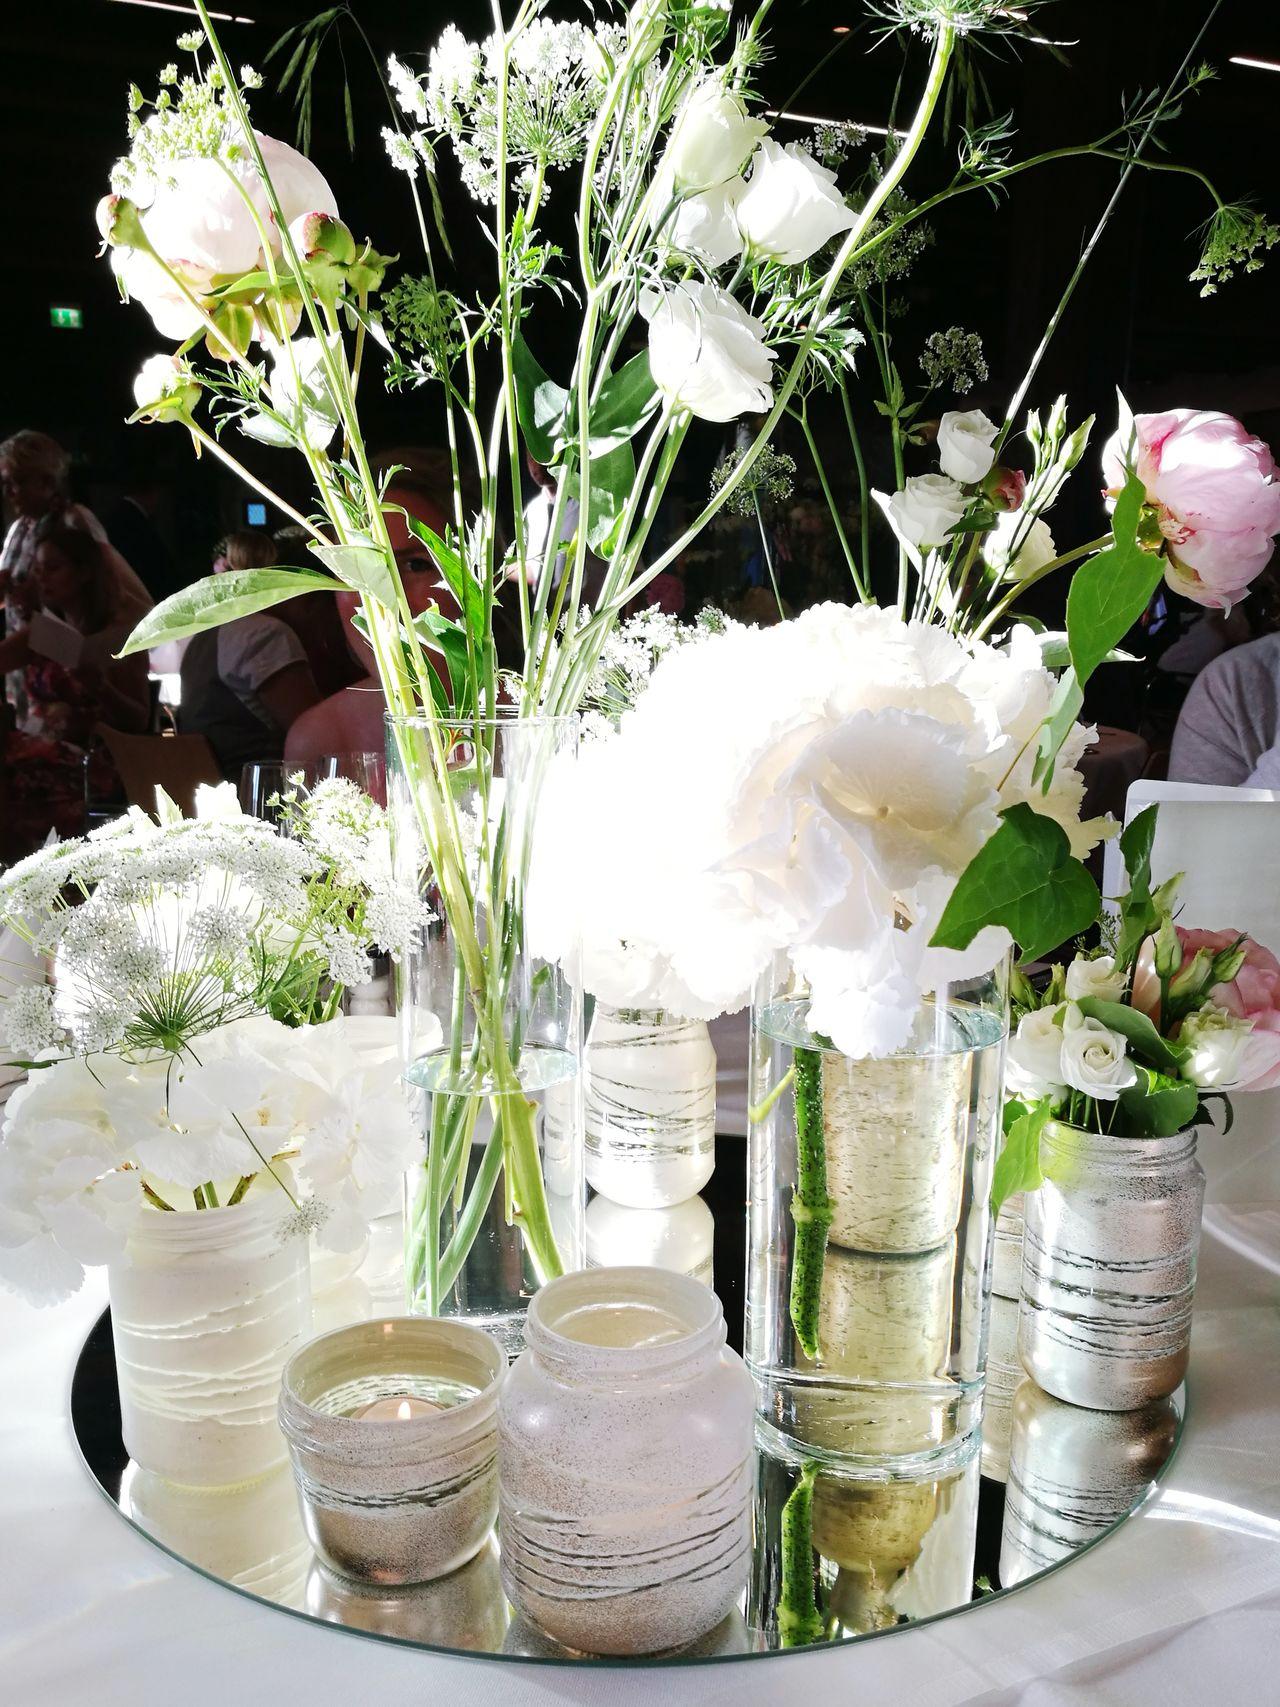 Wedding Vase Table Flower Indoors  Celebration Bouquet No People Plant Centerpiece Freshness Nature Flower Head